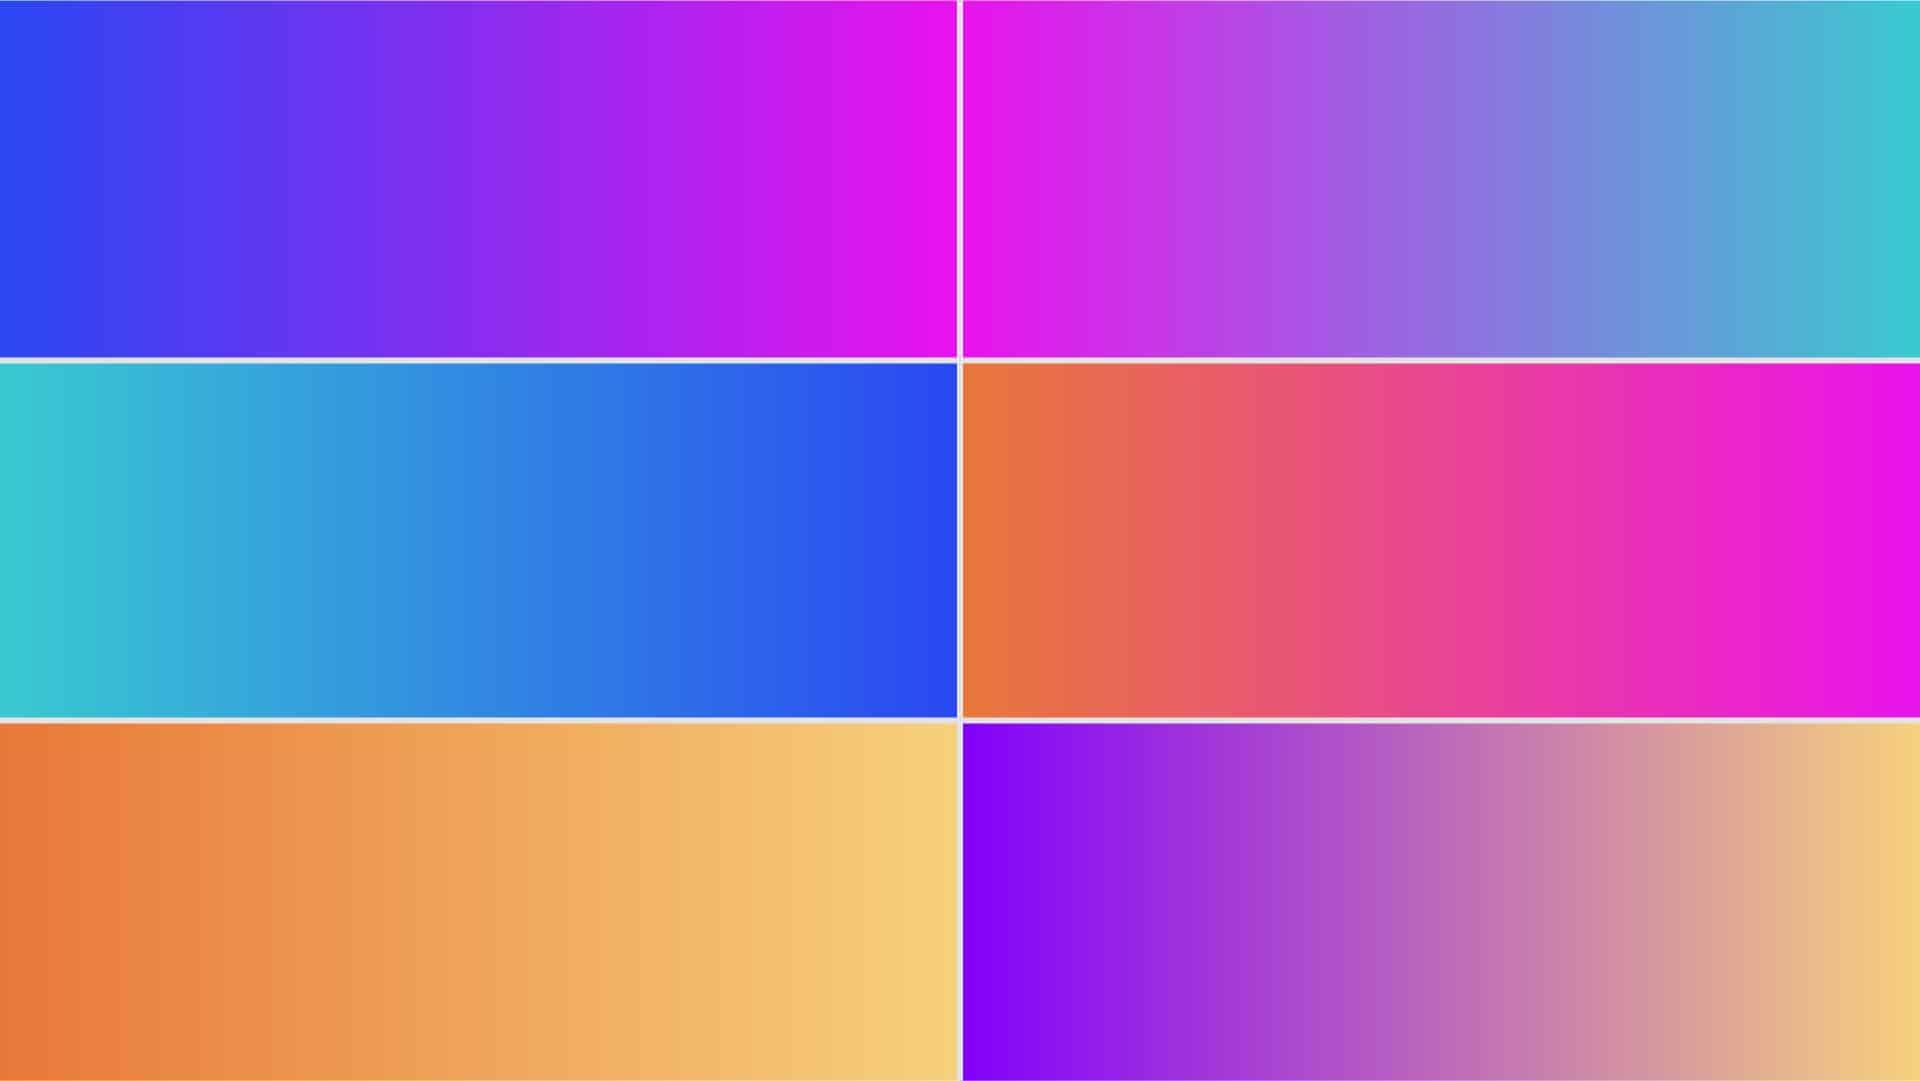 fitosophy-dataworld-summit-background-gradients